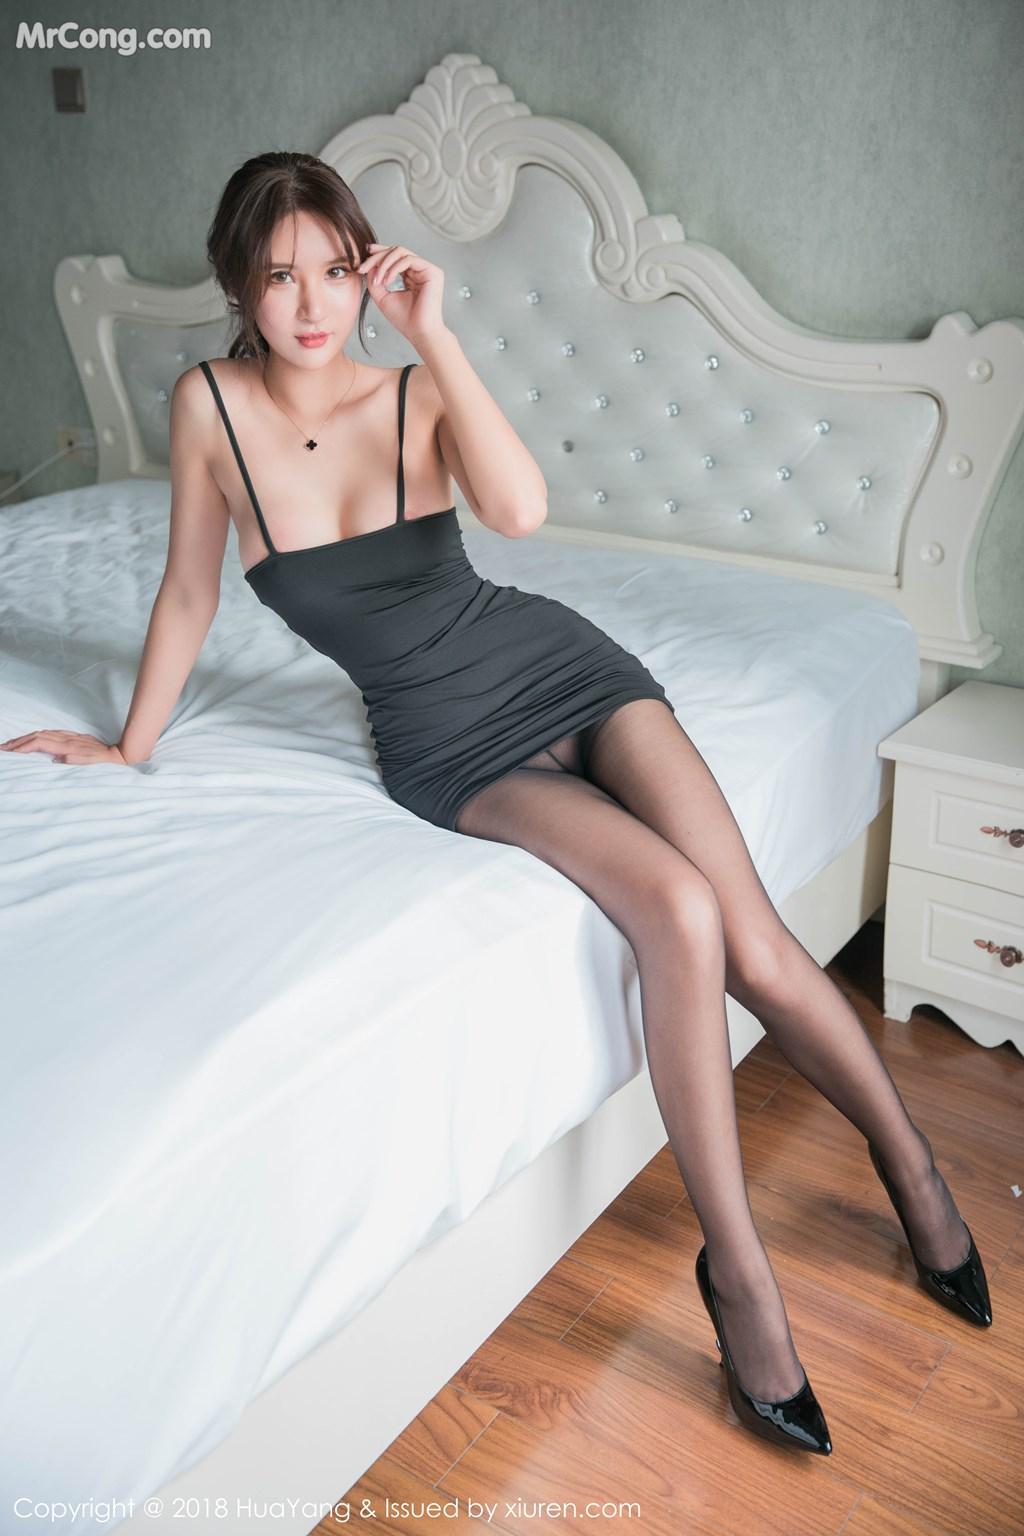 Image HuaYang-2018-11-14-Vol.095-SOLO-MrCong.com-014 in post HuaYang 2018-11-14 Vol.095: Người mẫu SOLO-尹菲 (46 ảnh)